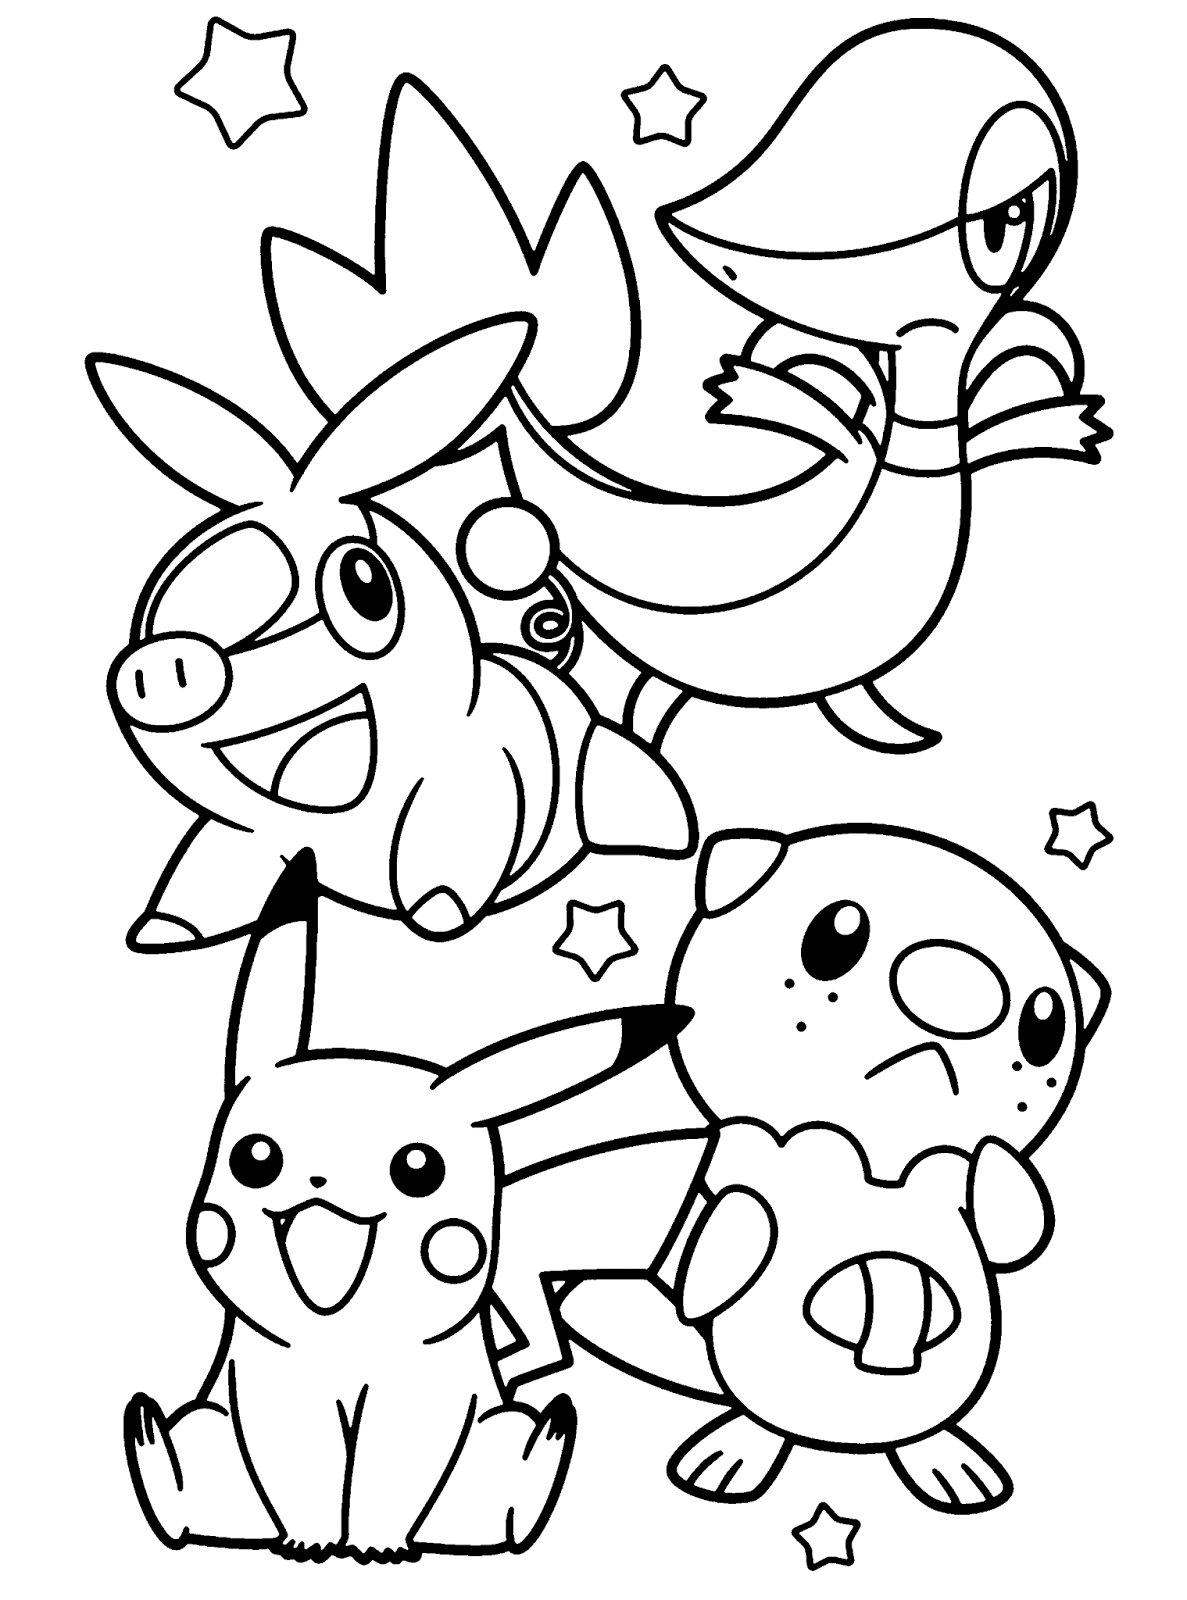 Pokemon Colorir Pintar Imprimir Desenhos Molde Risco Desenho